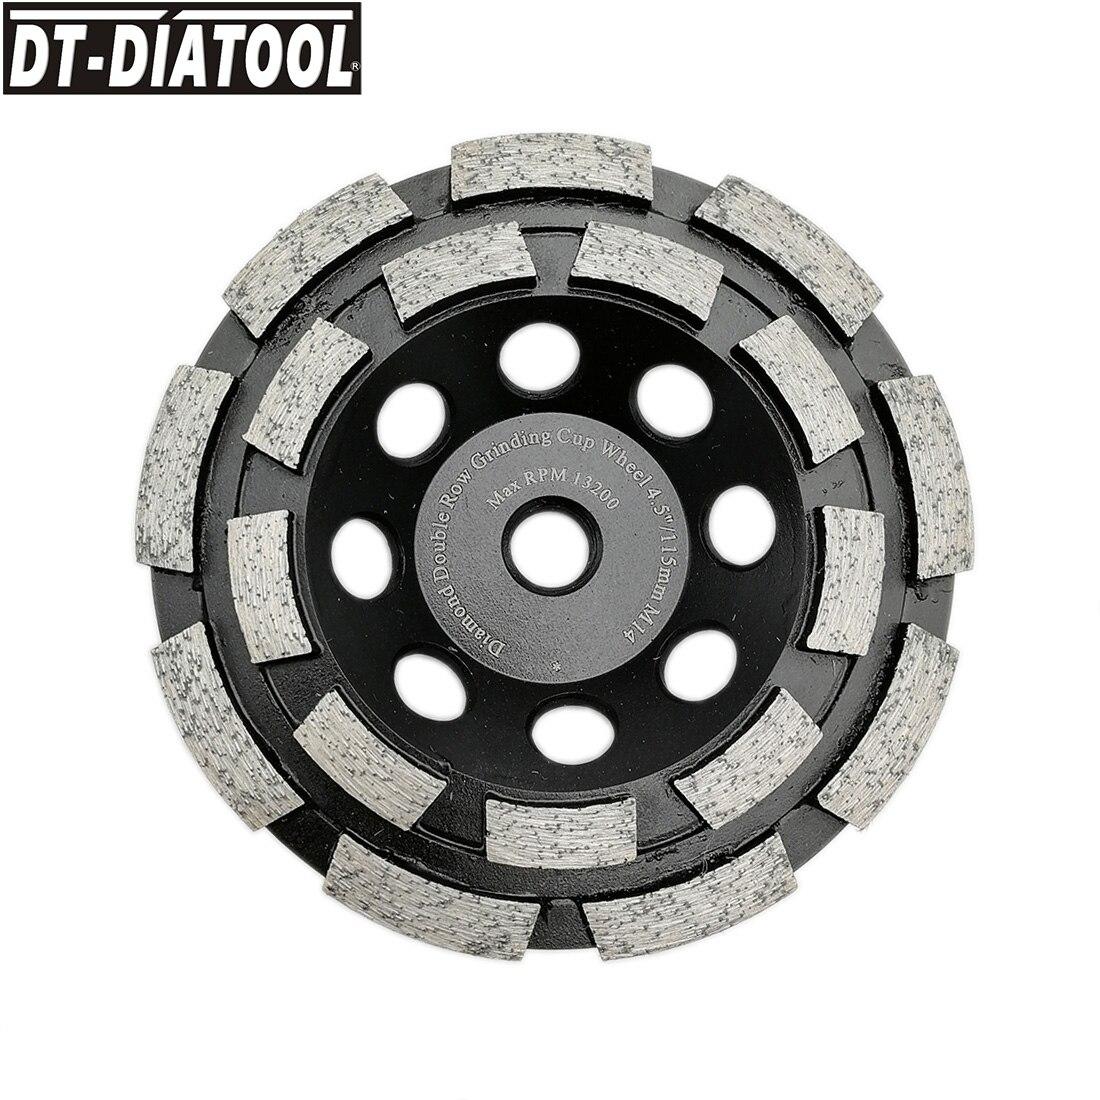 Rebolo para Concreto Dt-diatool Thread Diâmetro 115mm – 4.5 Polegada Diamante Dupla Fileira Copo Pedra Dura Mármore Mranite 1pc M14